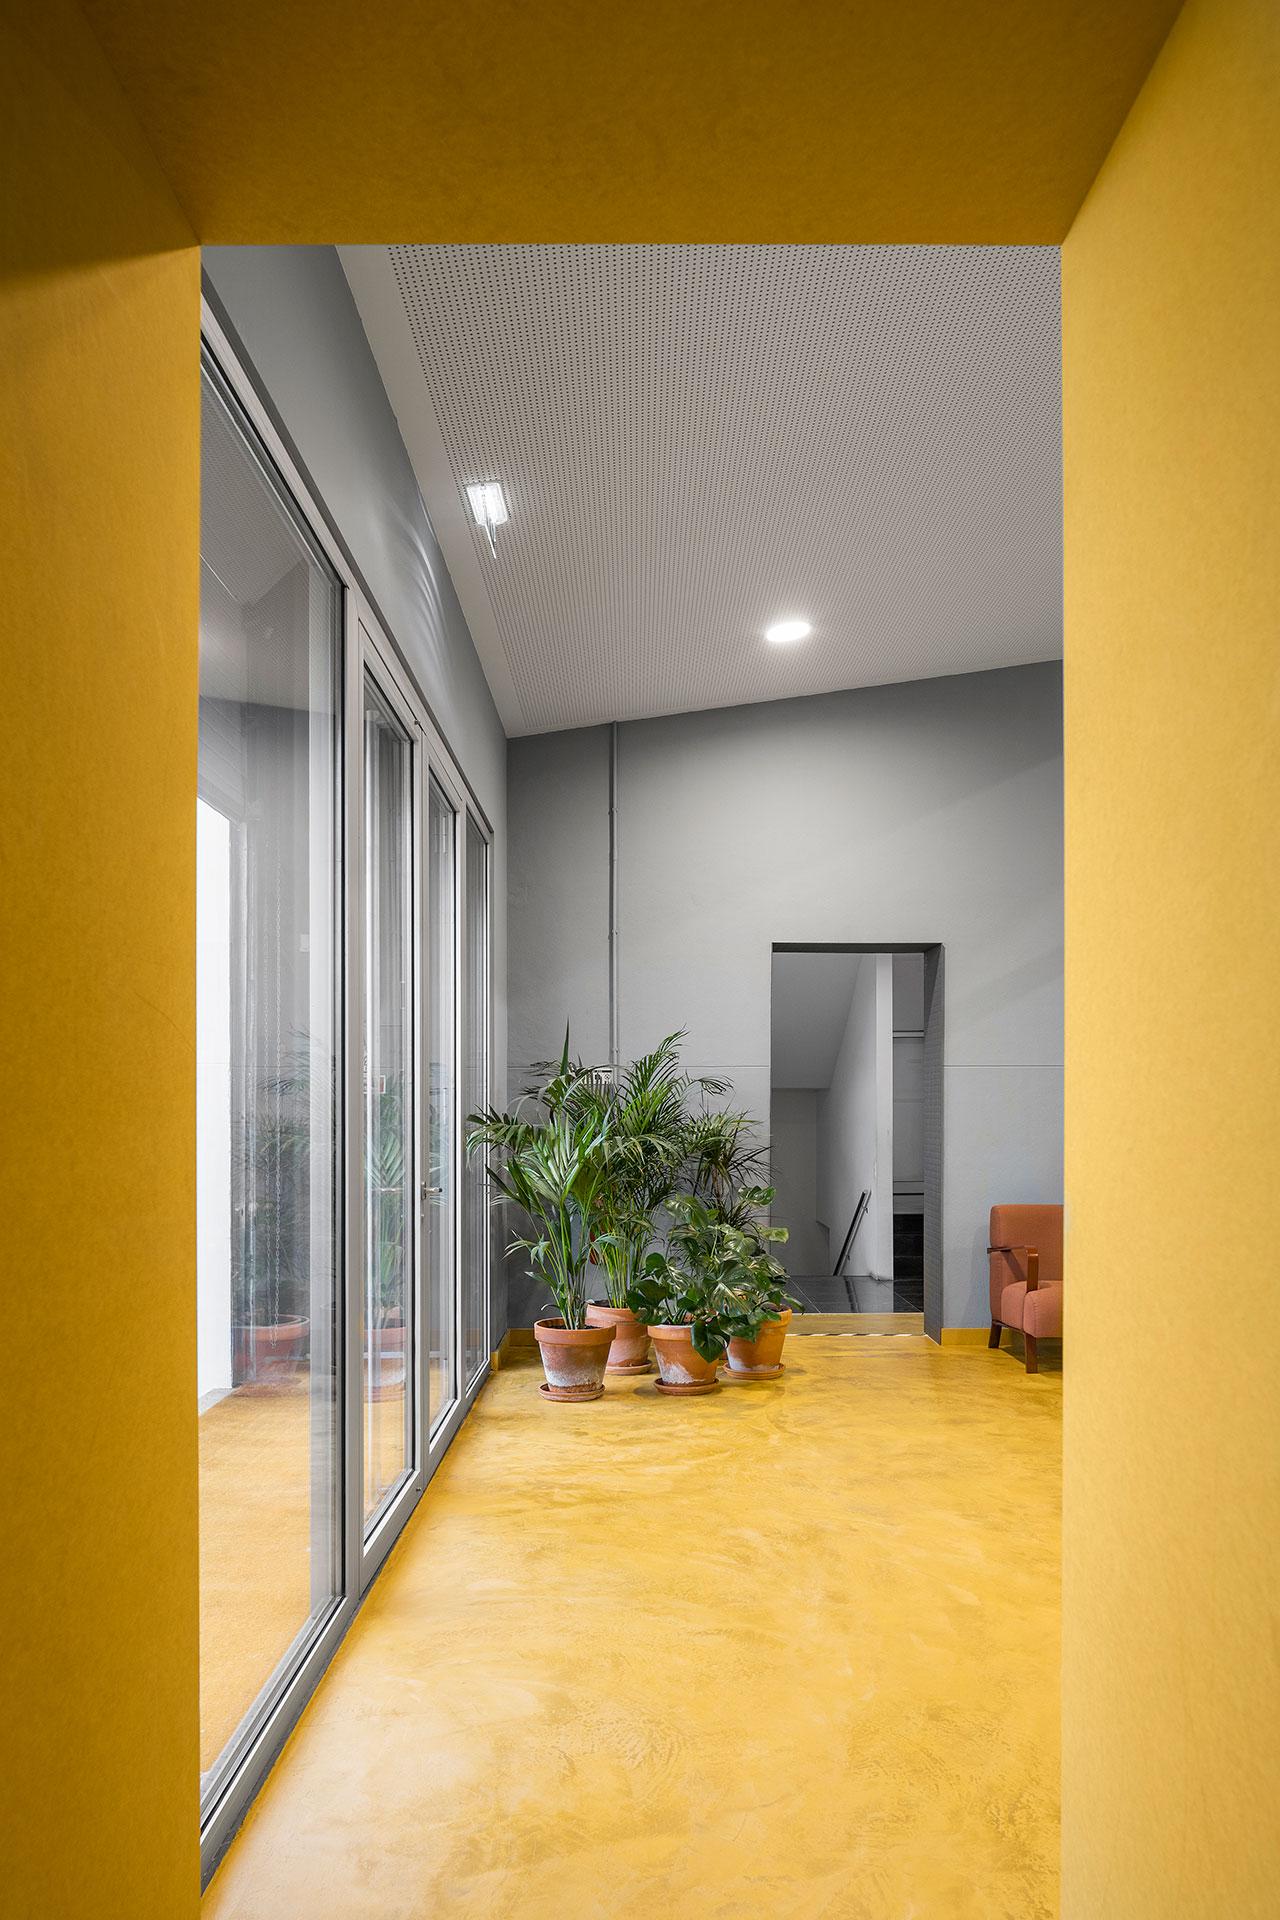 Spectris Innovation Centre by STUDIUM. Photo by Ivo Tavares Studio.